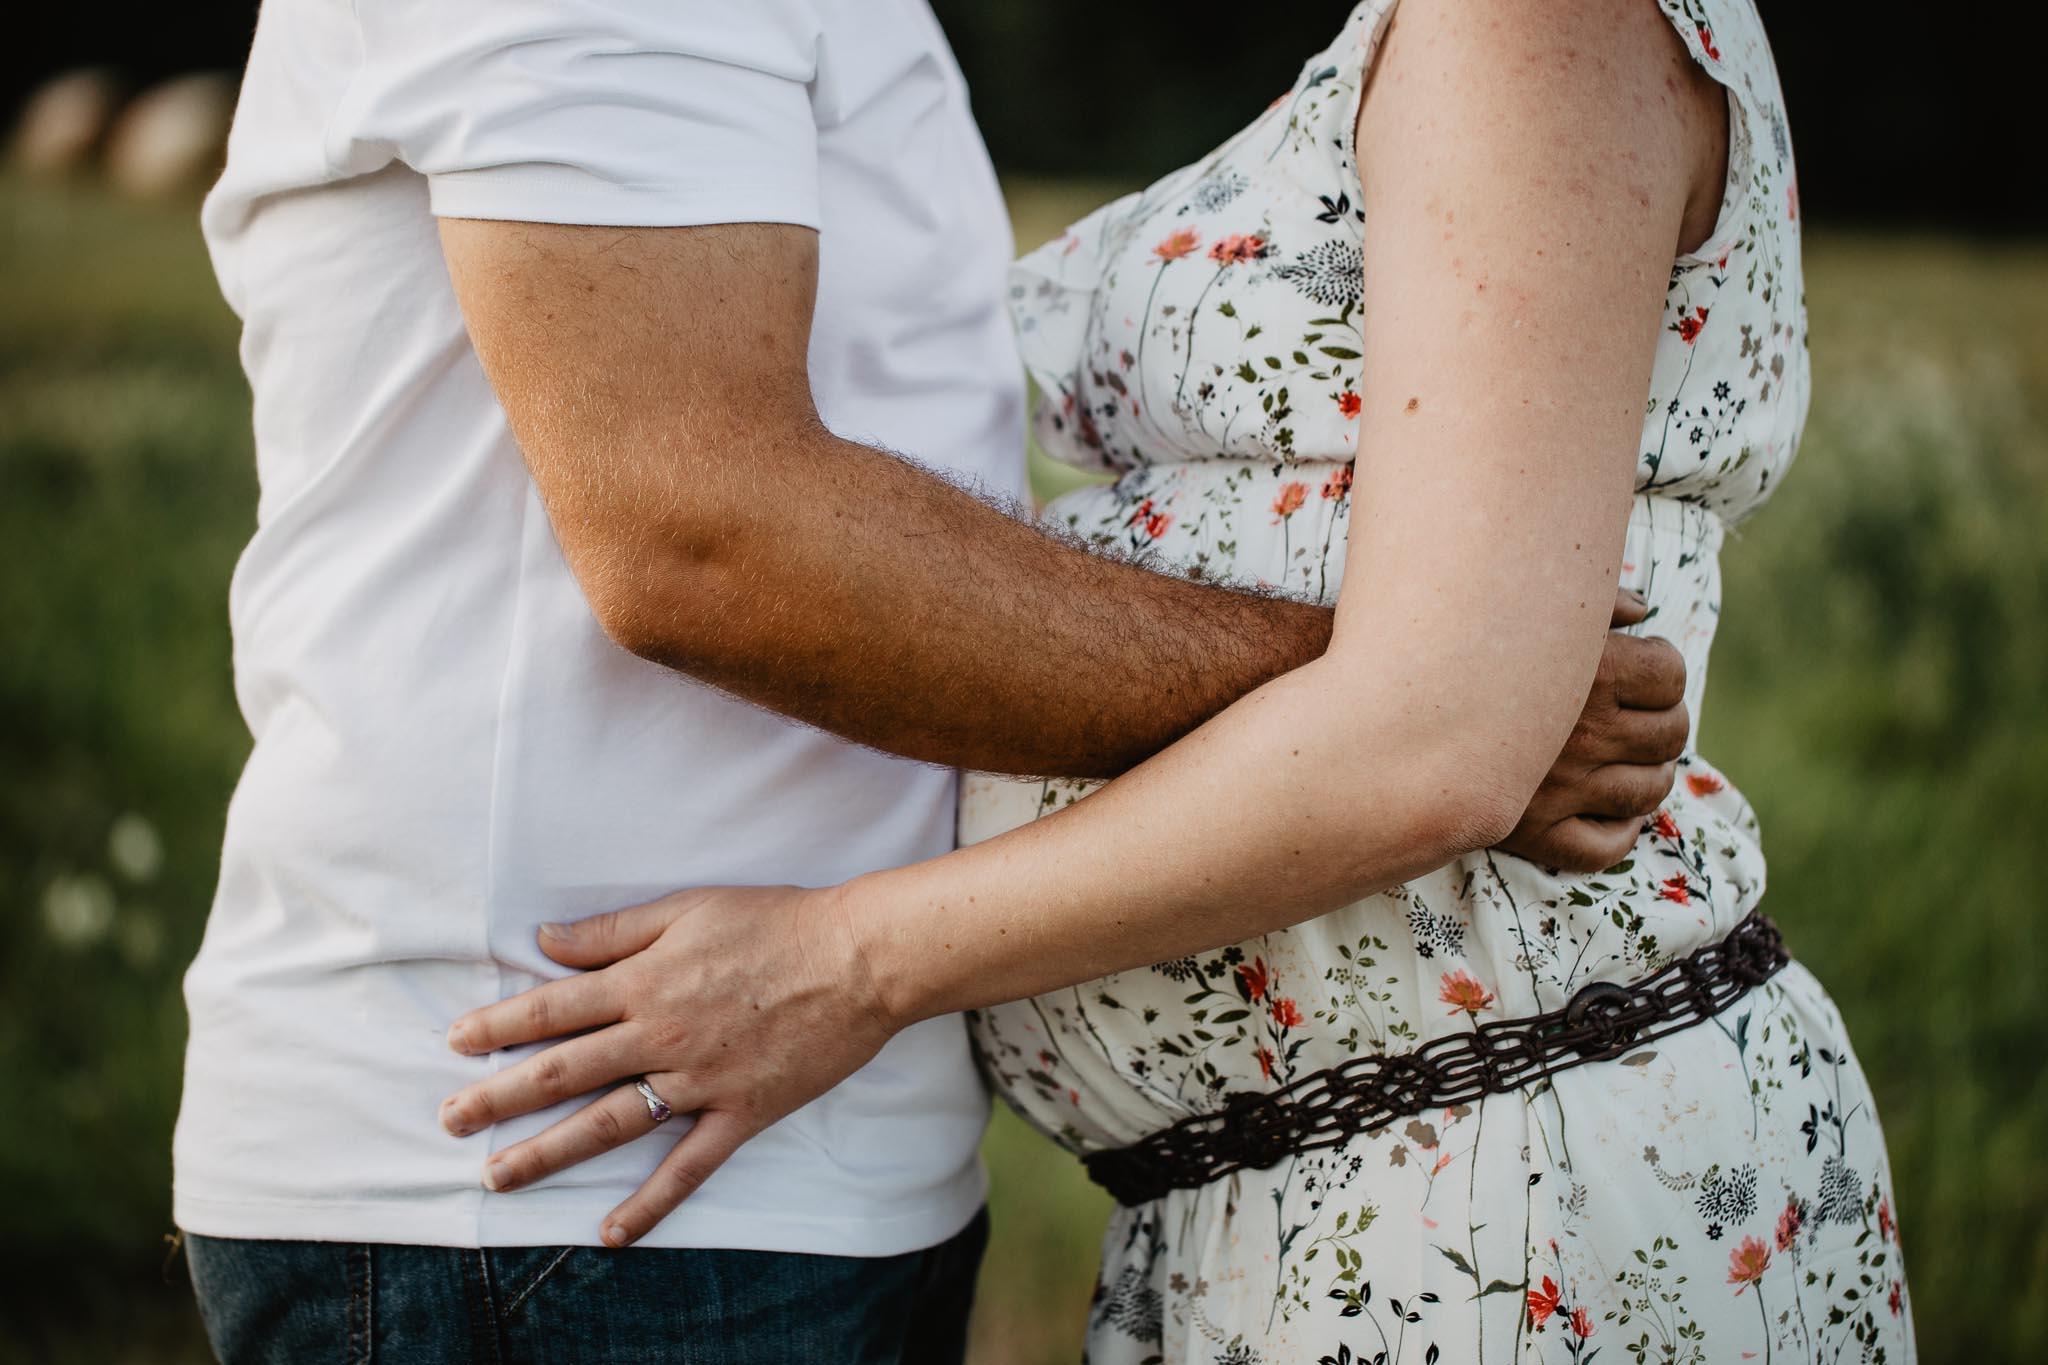 grossesse-femme-enceinte-couple-nature-campagne-ingold-photographe-53.jpg